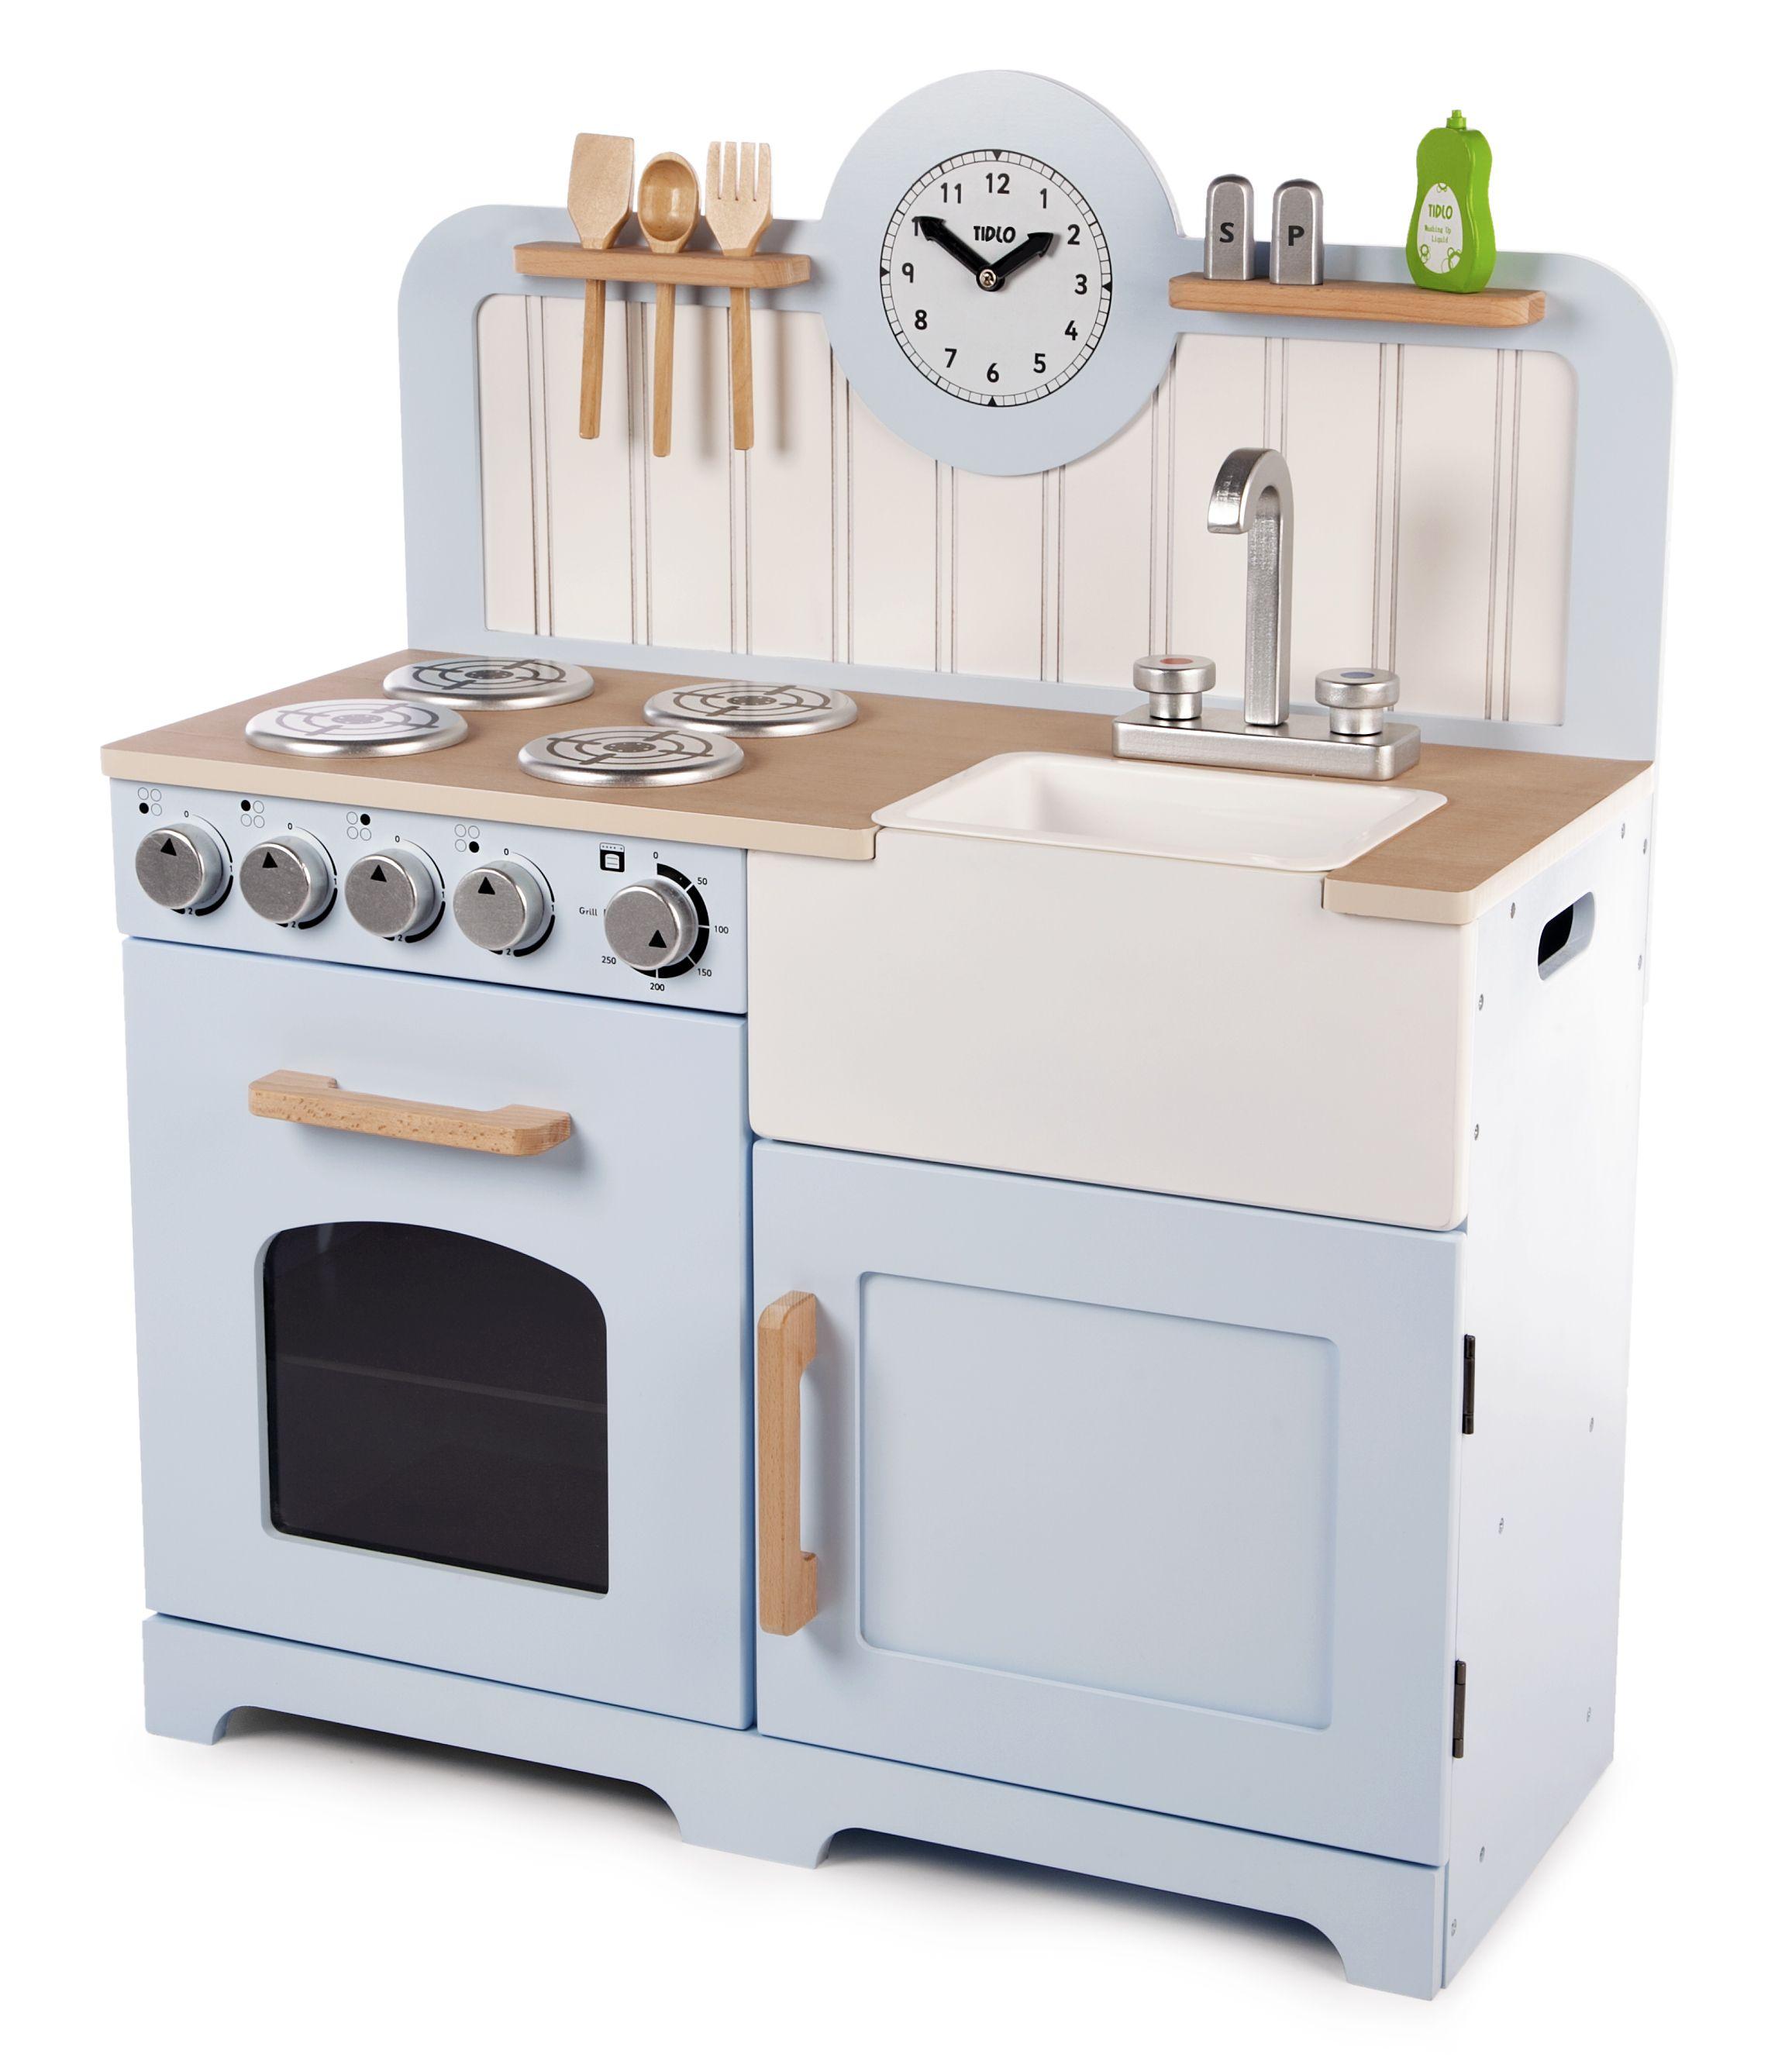 Country kitchen wooden toys pinterest toy kitchen kitchen and